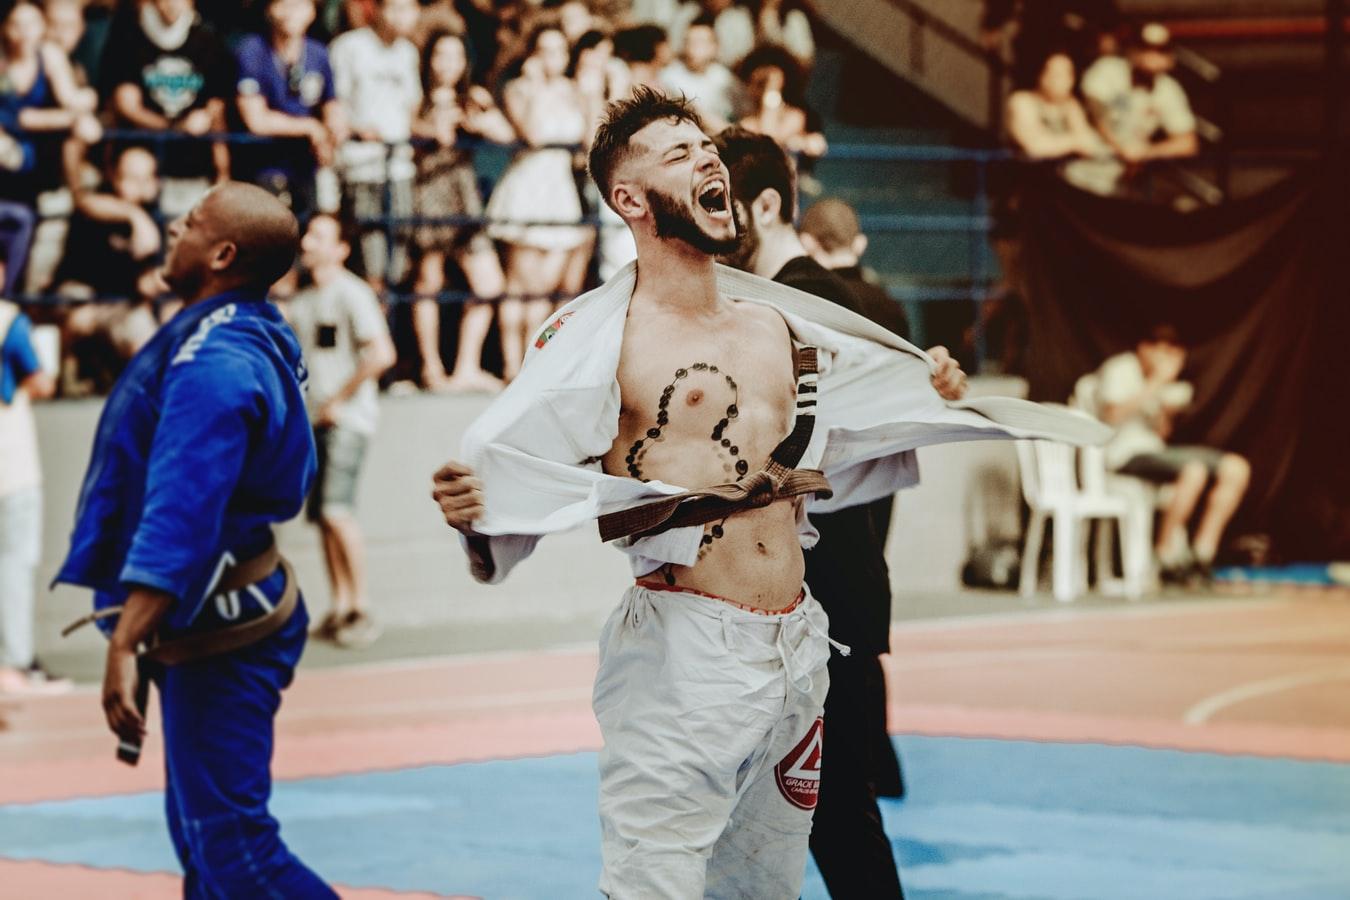 black belt in jiu-jitsu, jiu jitsu